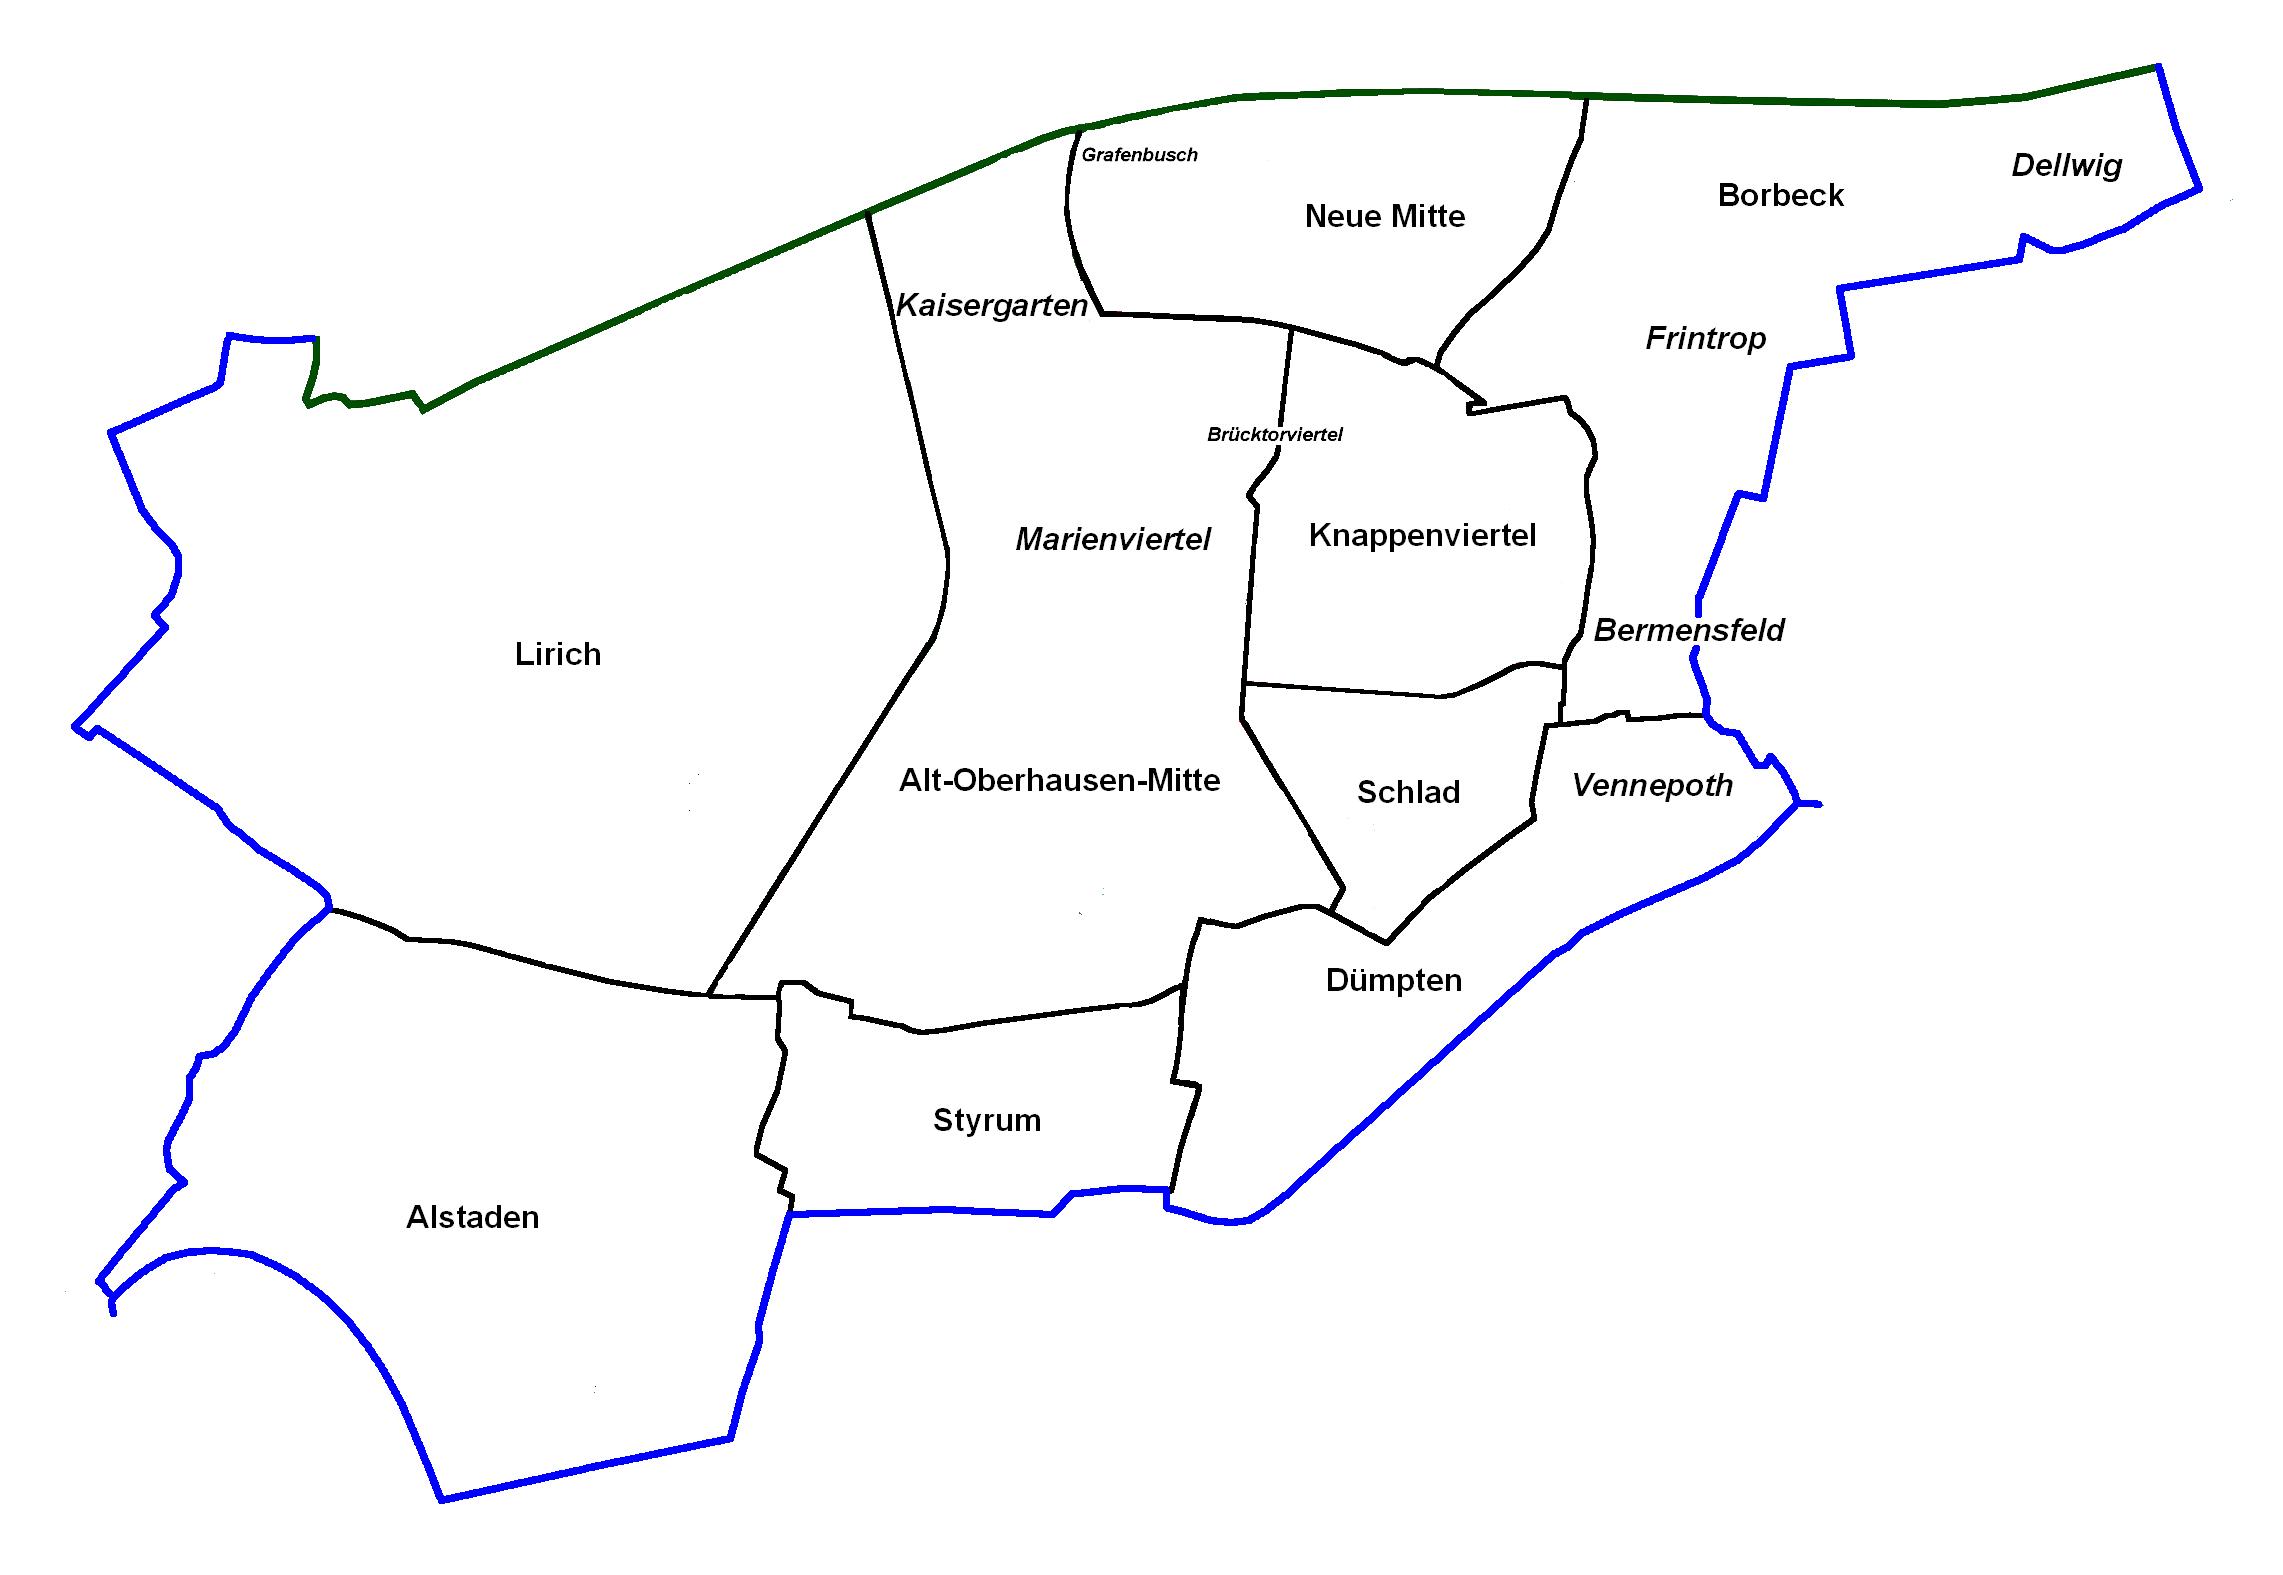 oberhausen karte Datei:OB Karte Alt Oberhausen.png – Wikipedia